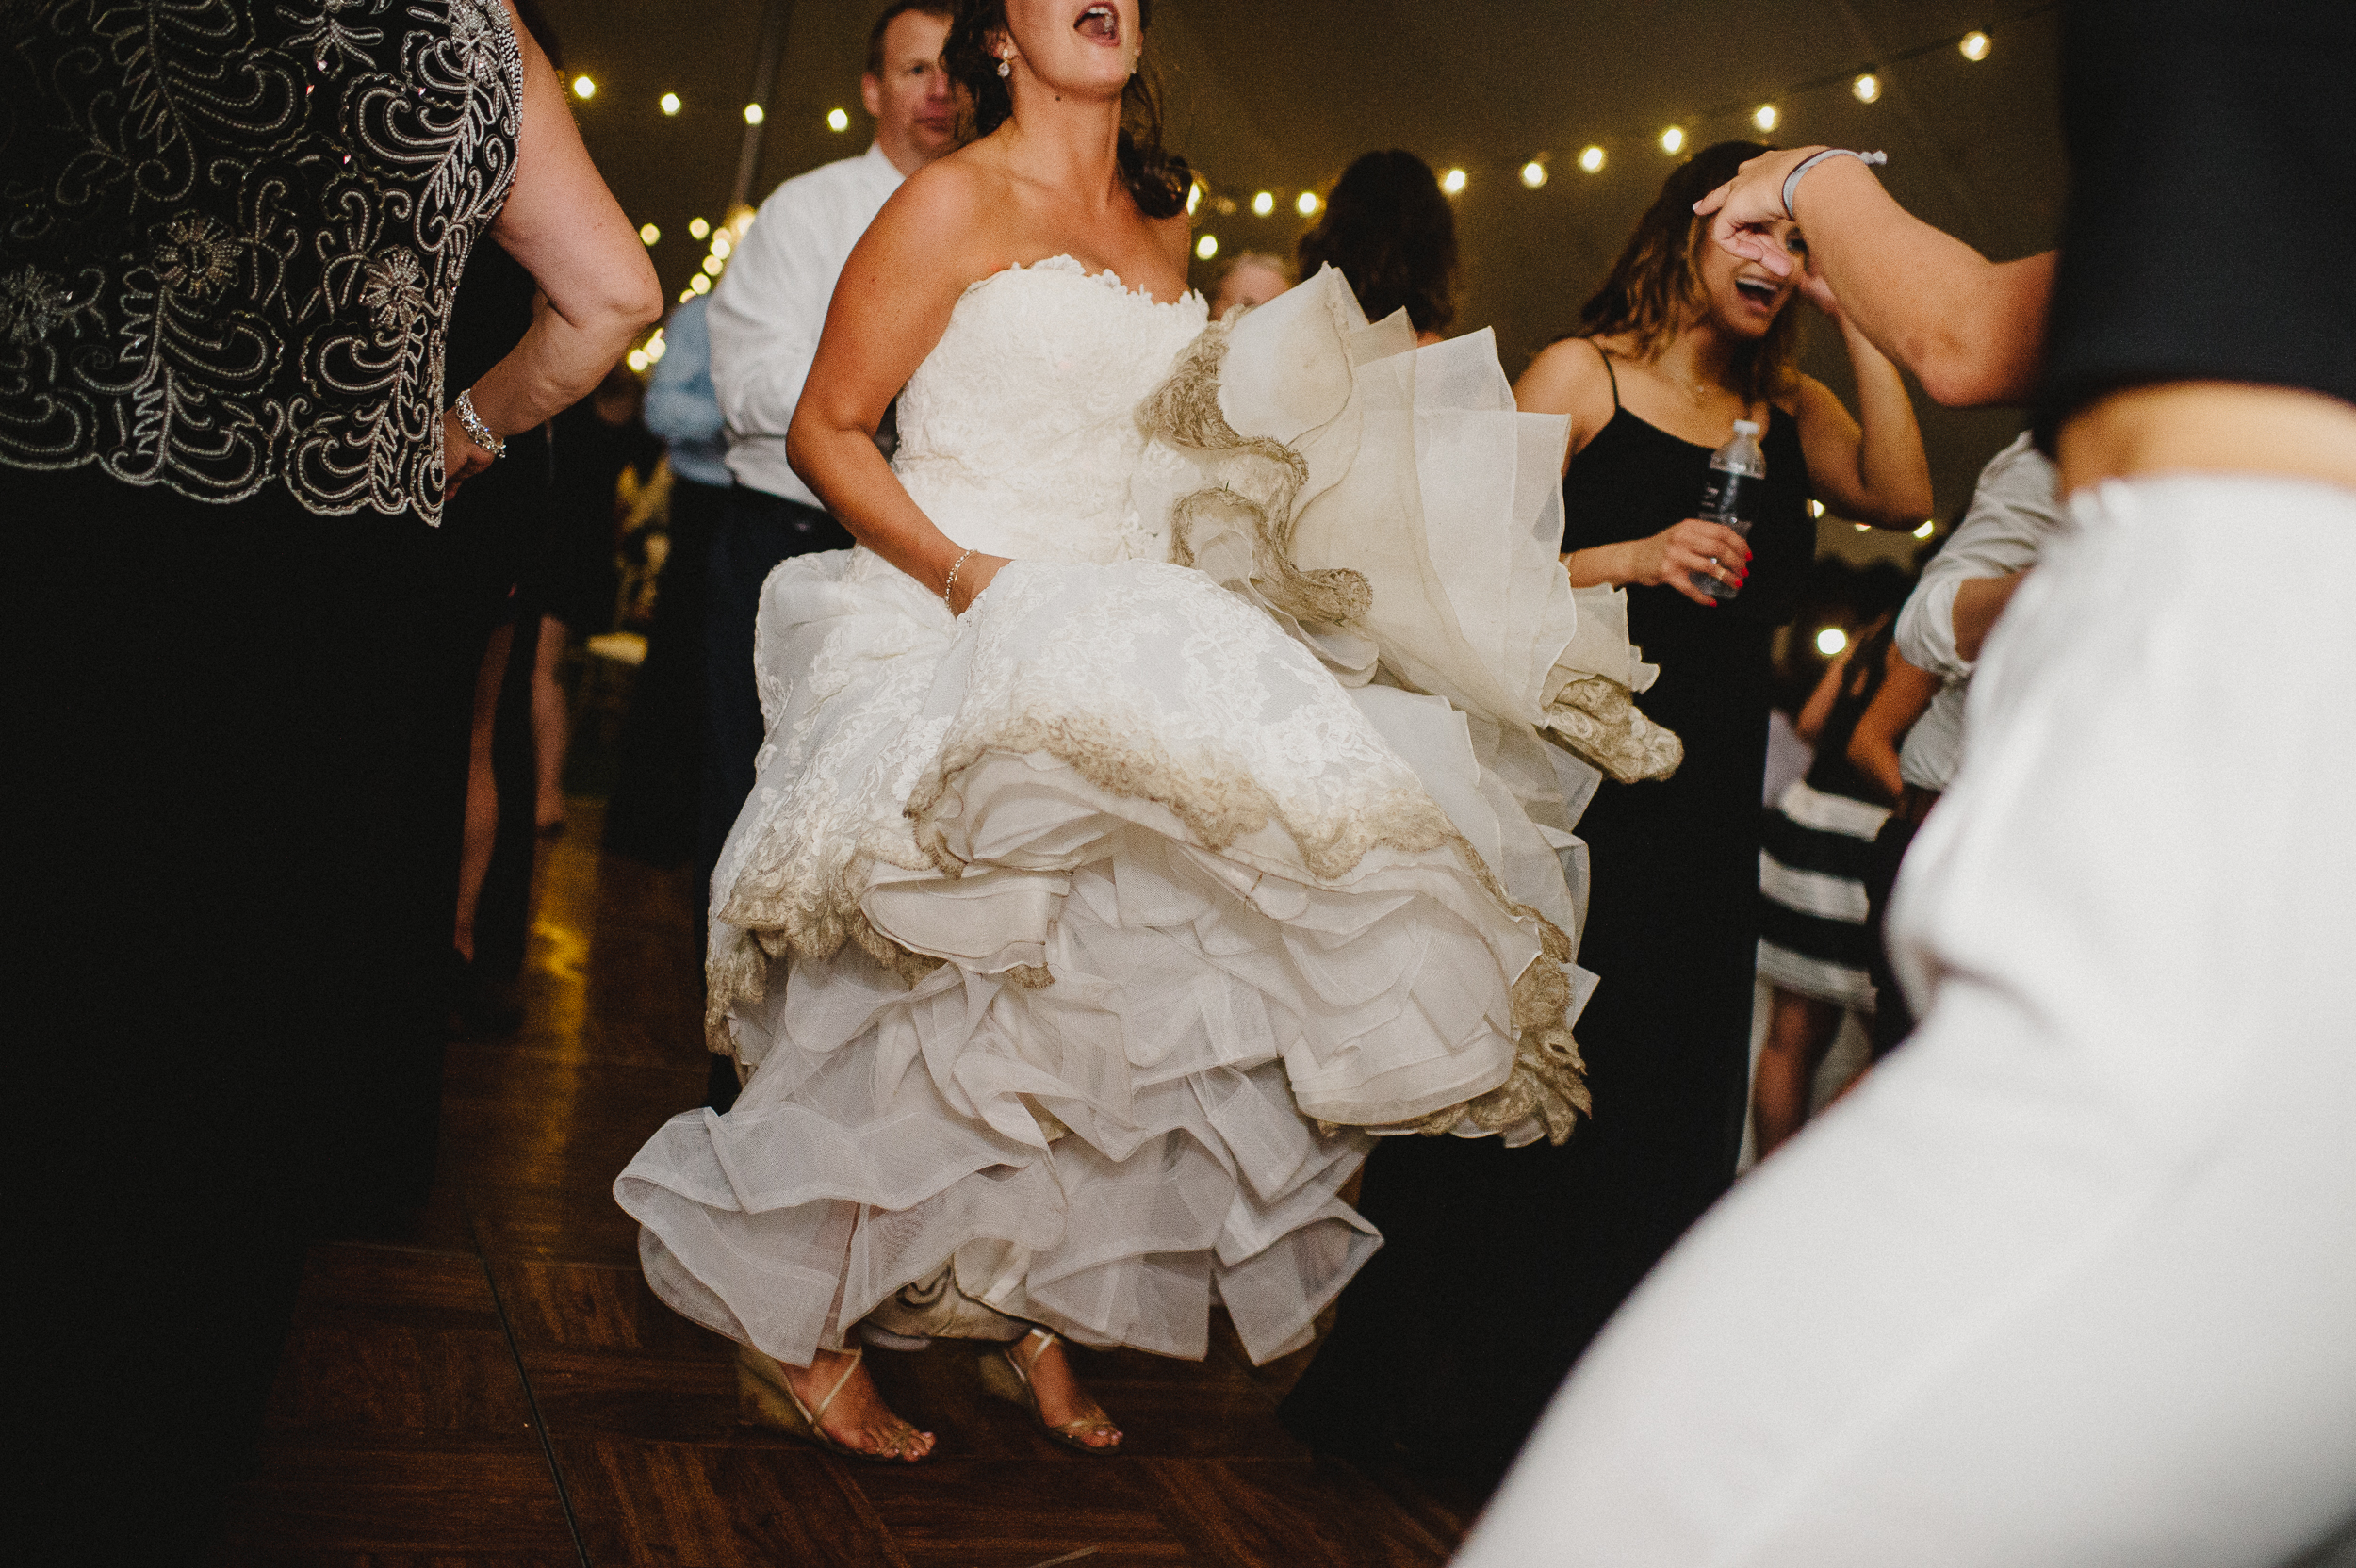 delaware-estate-wedding-photographer-pat-robinson-photography-138.jpg